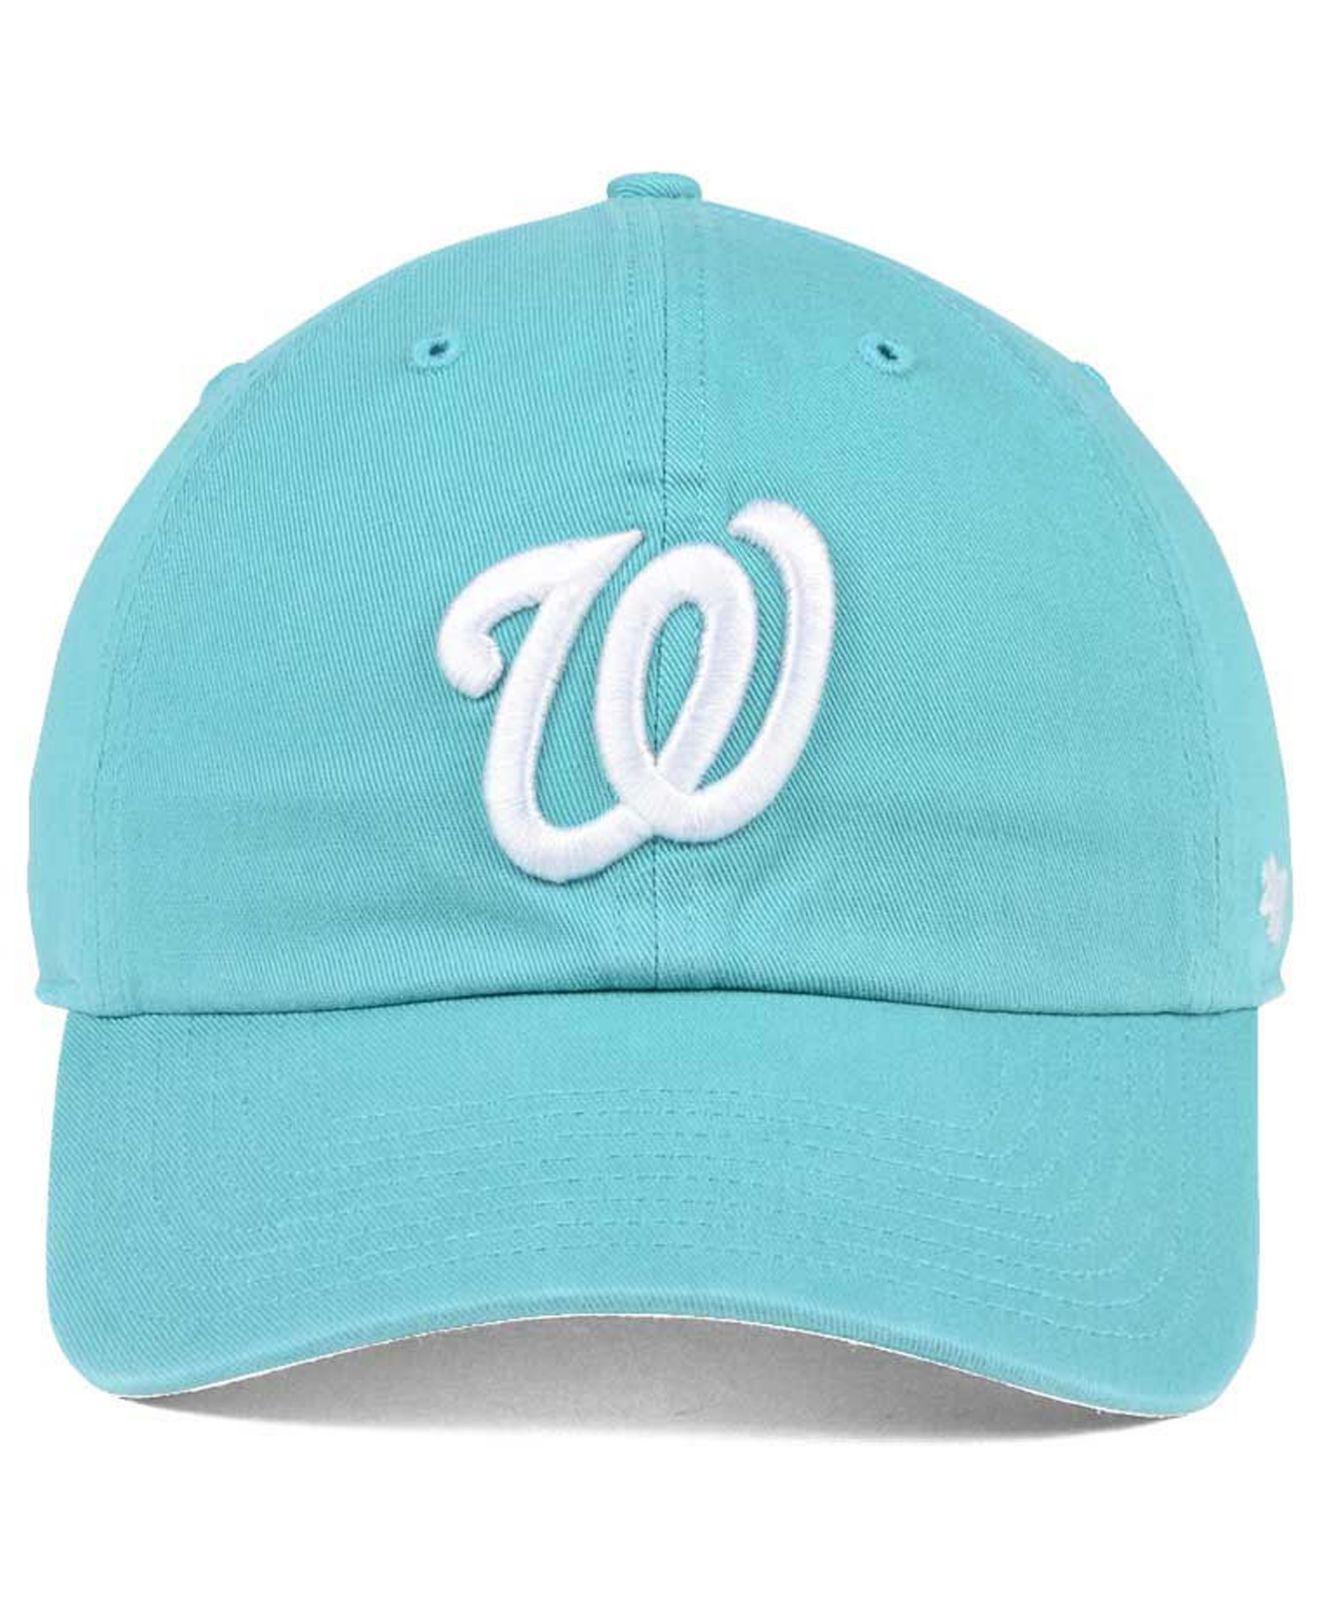 best website f628d 47271 ... norway lyst 47 brand lagoon clean up cap in blue 3c941 d3ed5